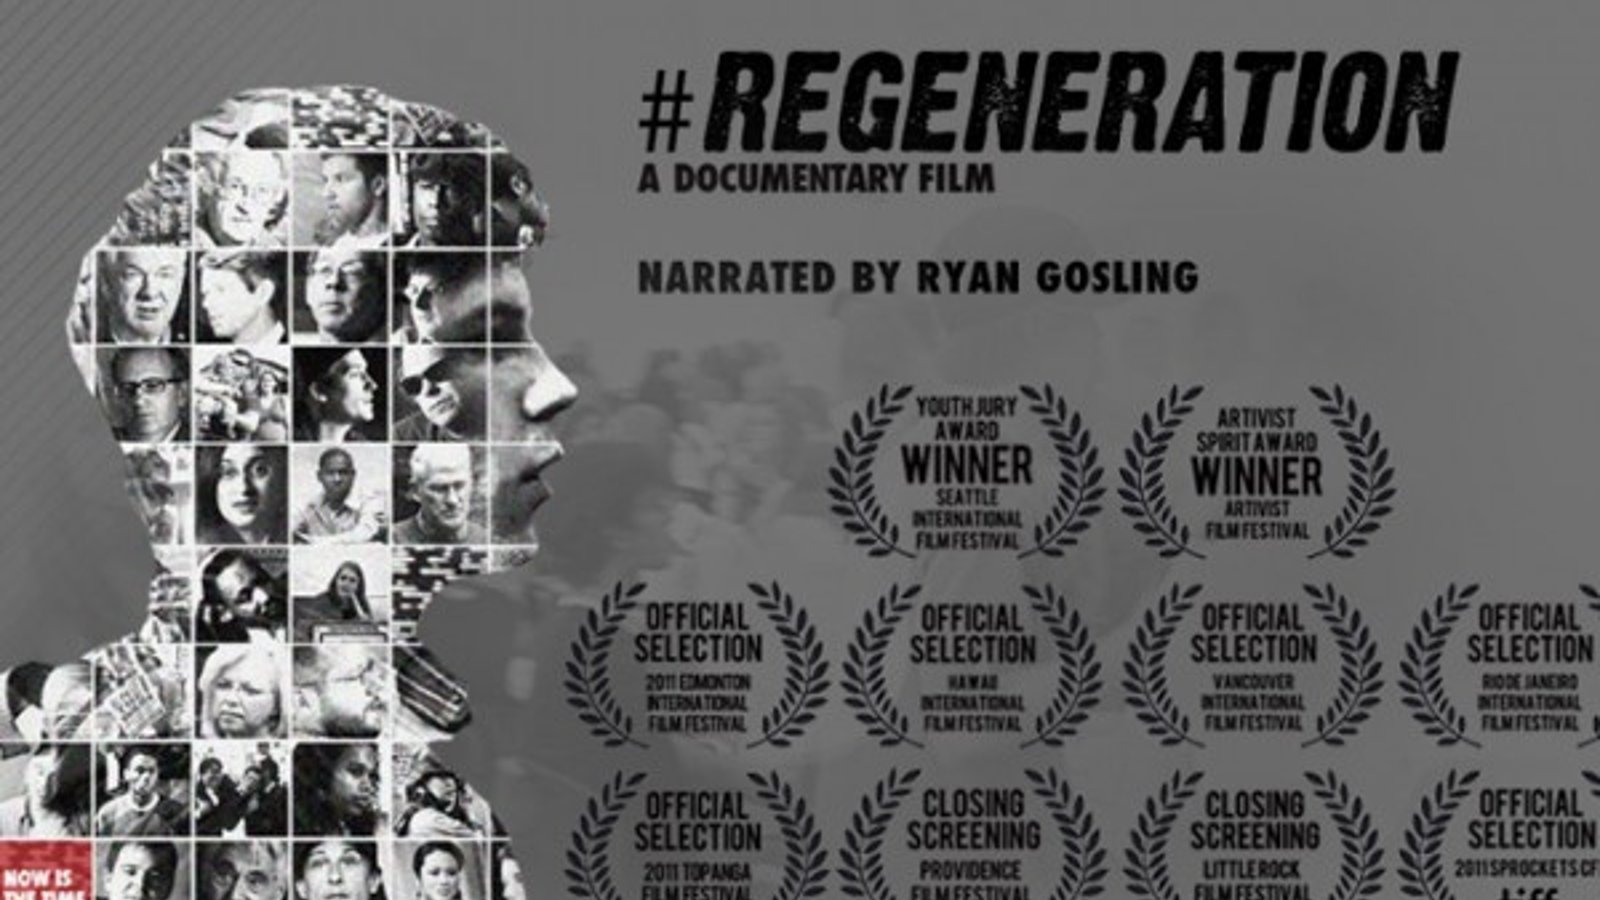 #ReGENERATION - Social Activism